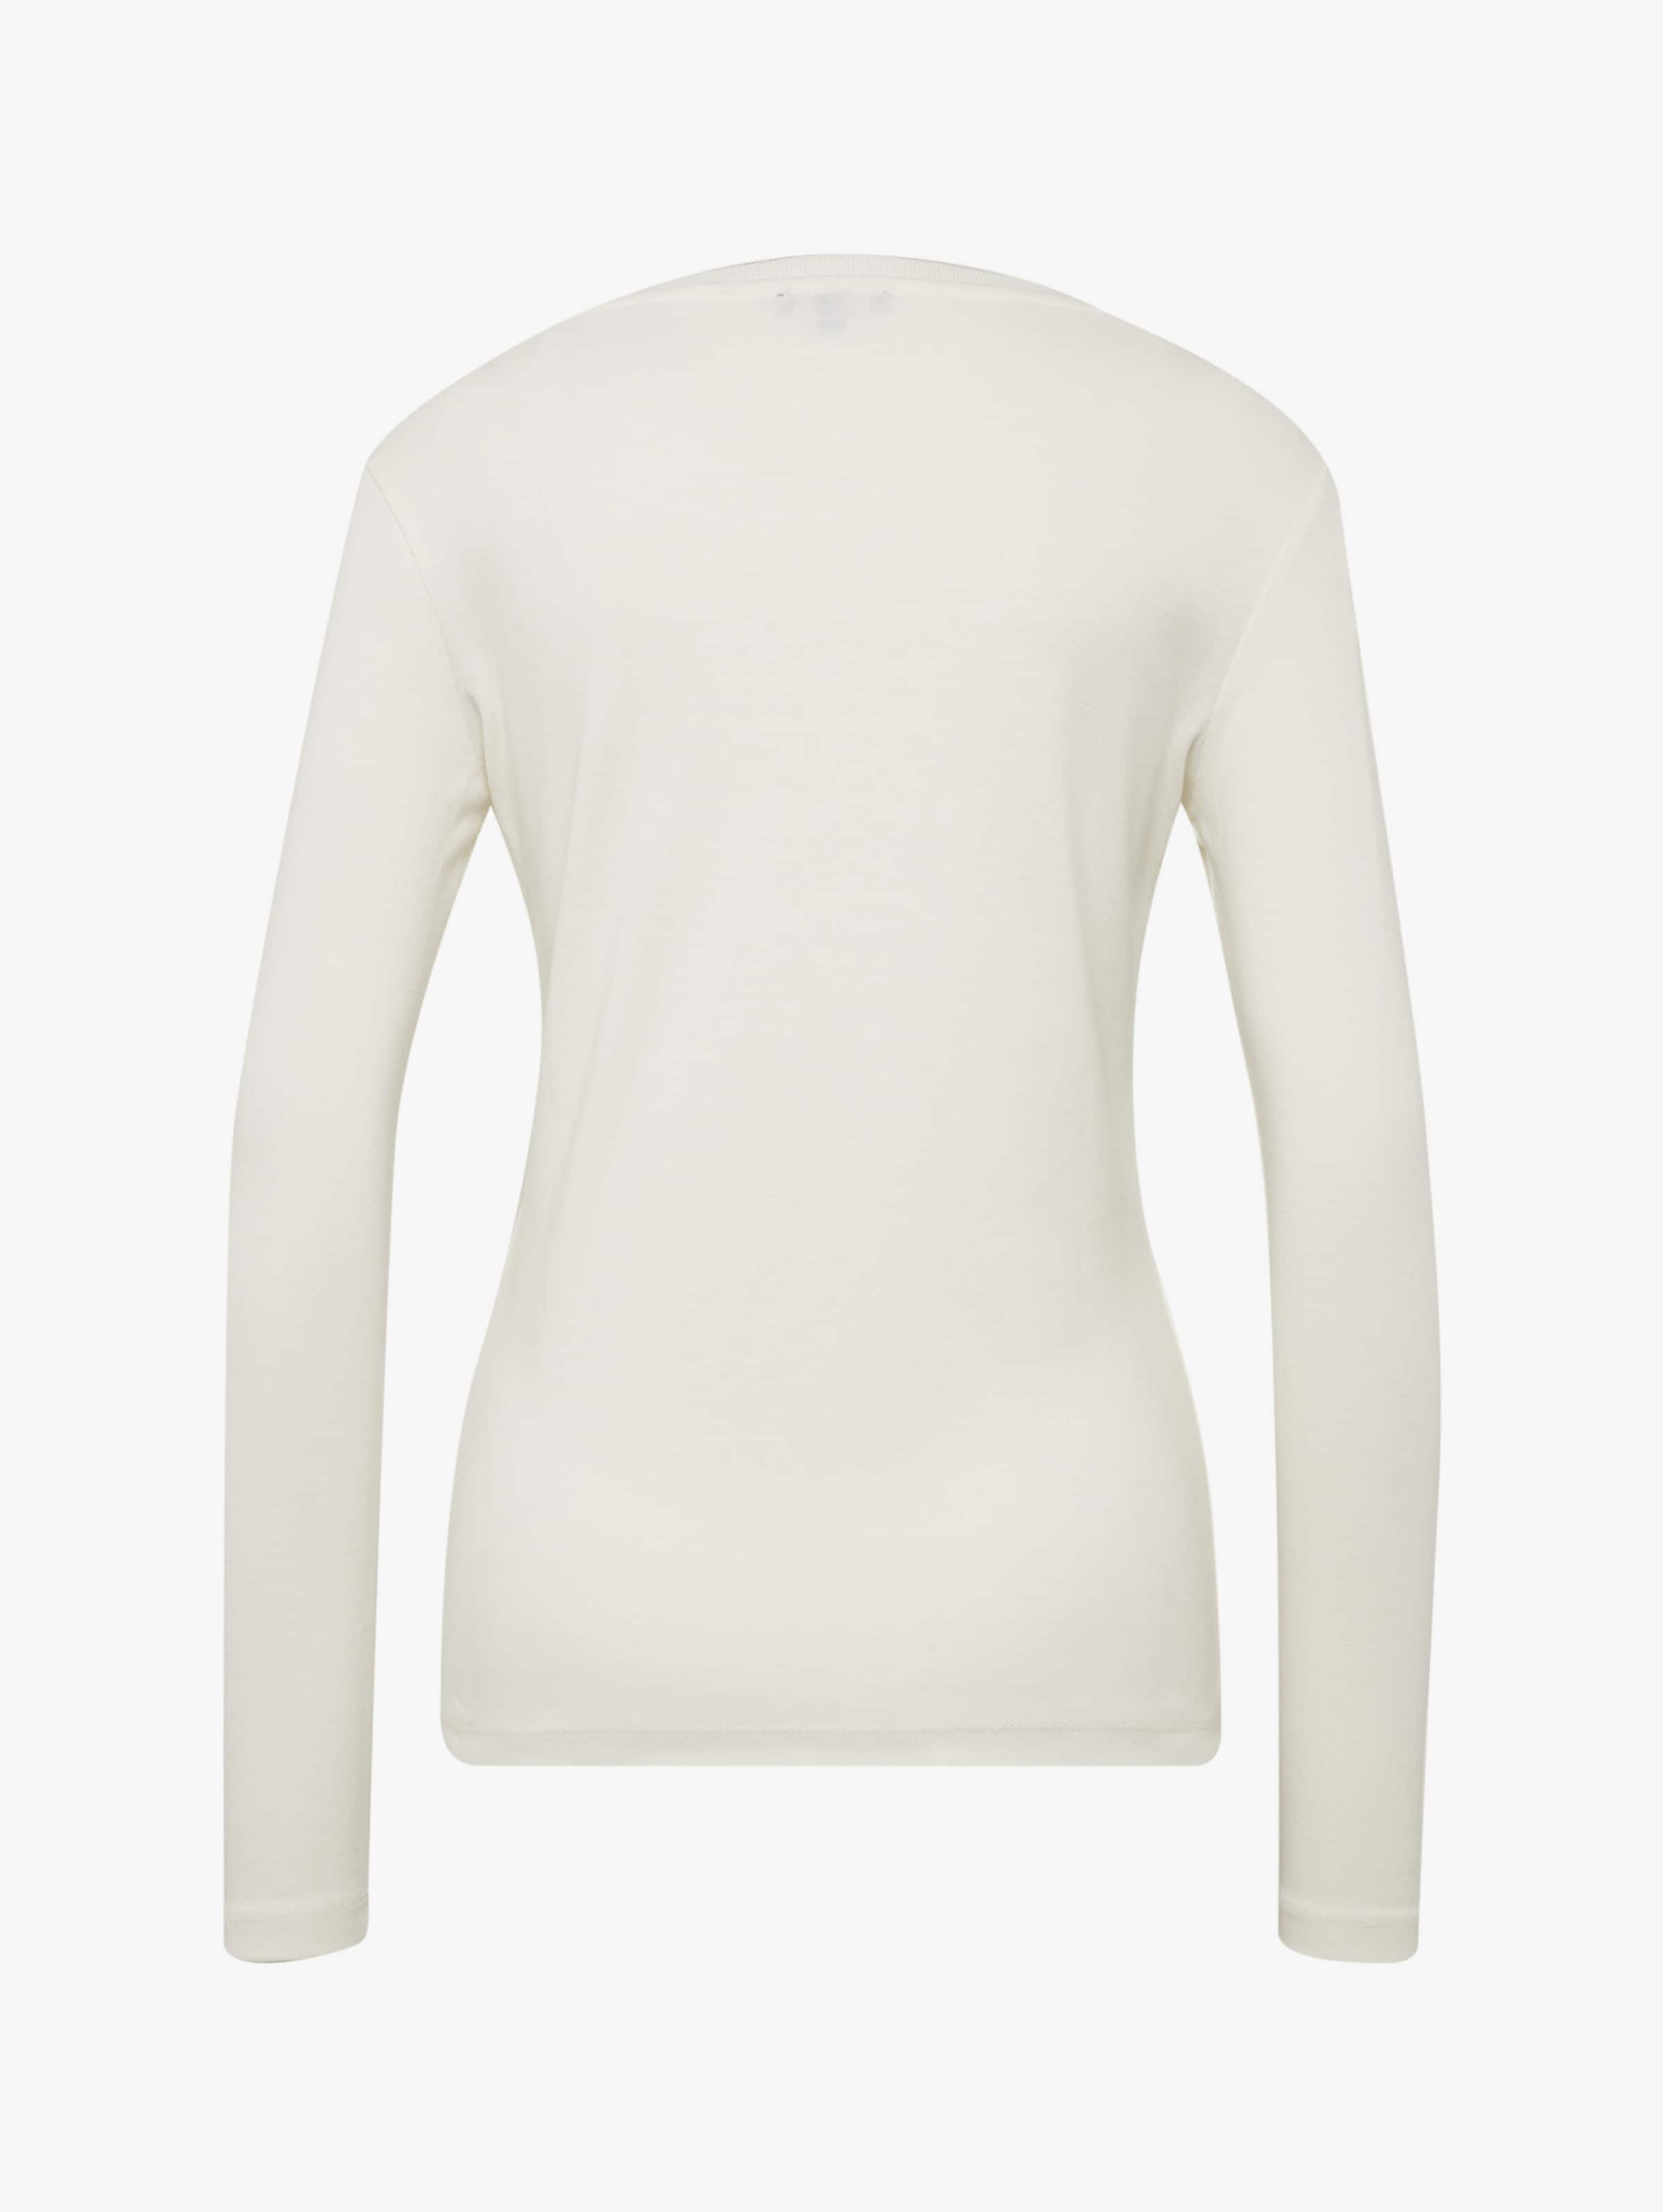 Offwhite Tailor Tom Shirt In Shirt Tailor Tom Ygfyvb76